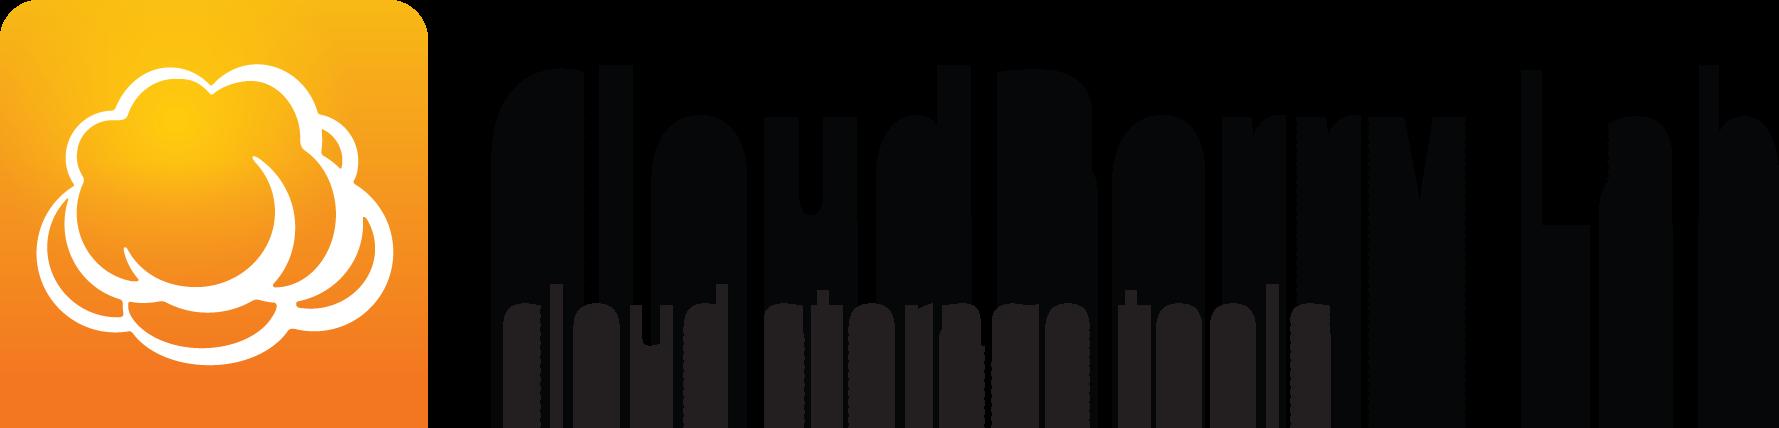 horizontal_cloudberry_logo